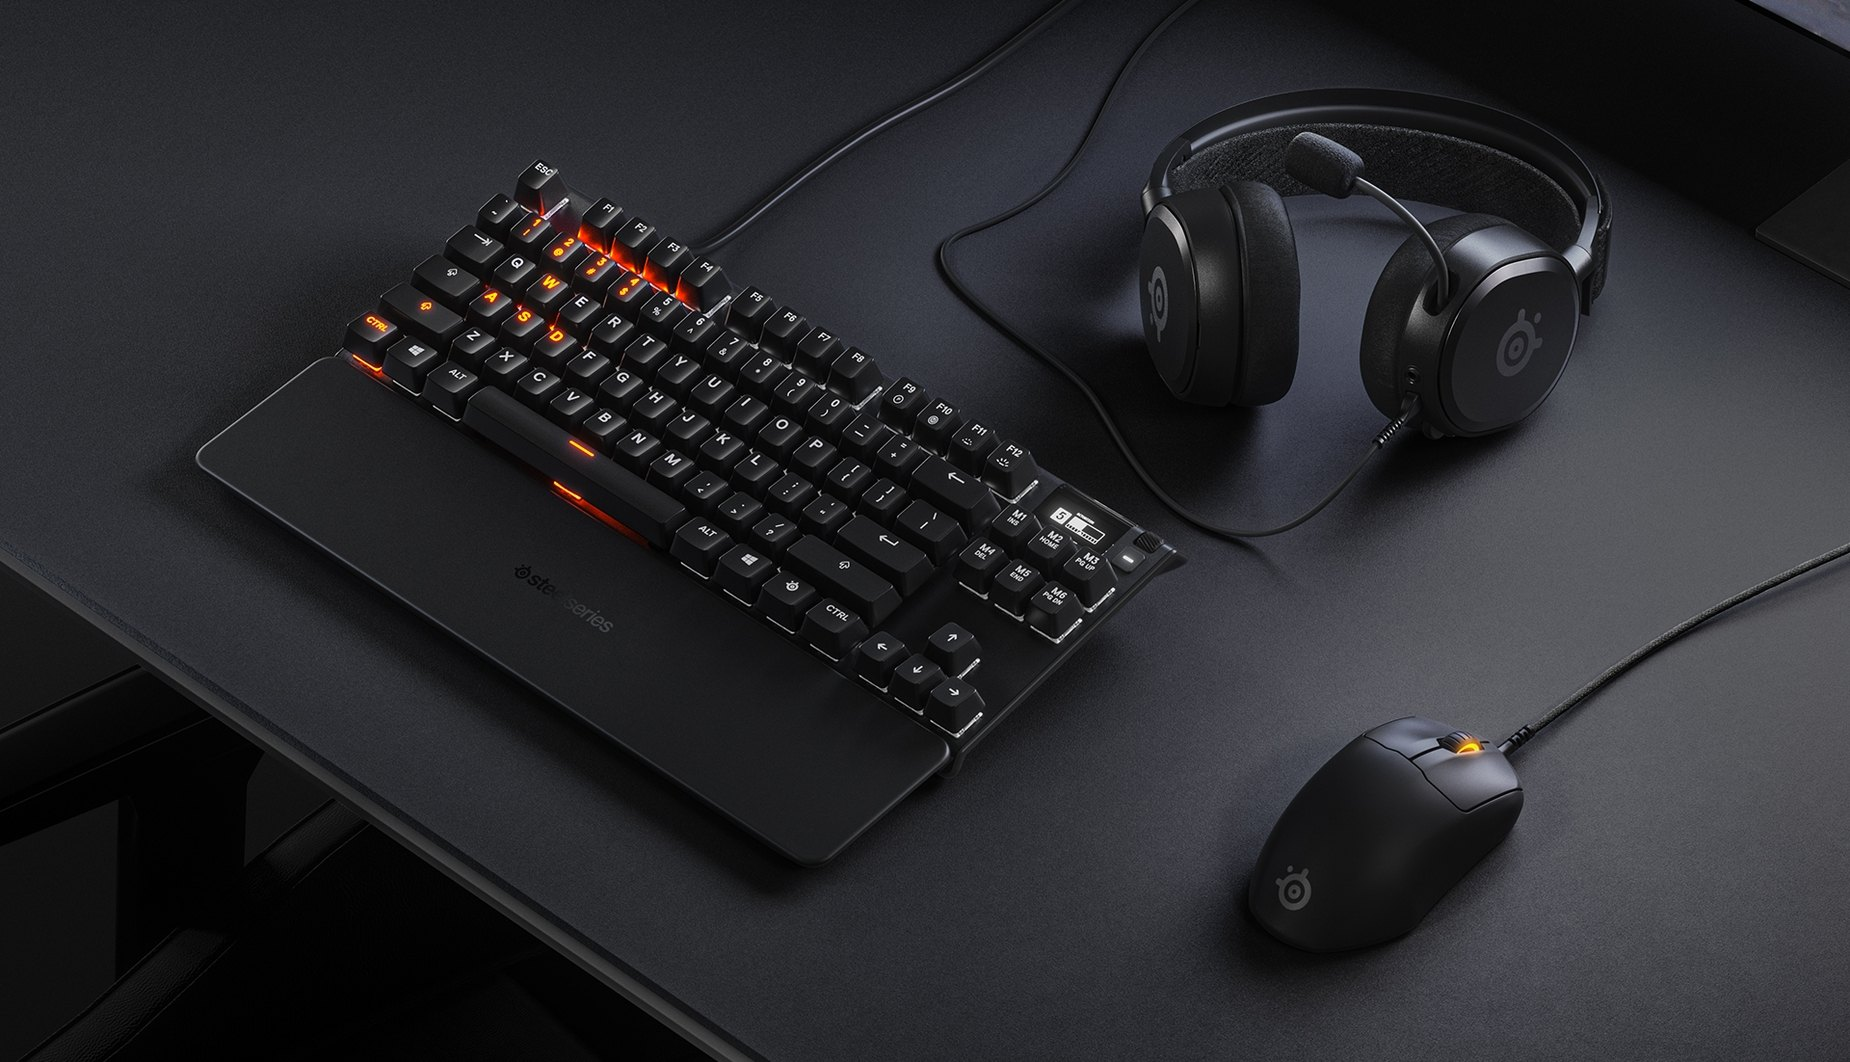 A sleek desktop setup with a Prime keyboard, mouse, and headset.